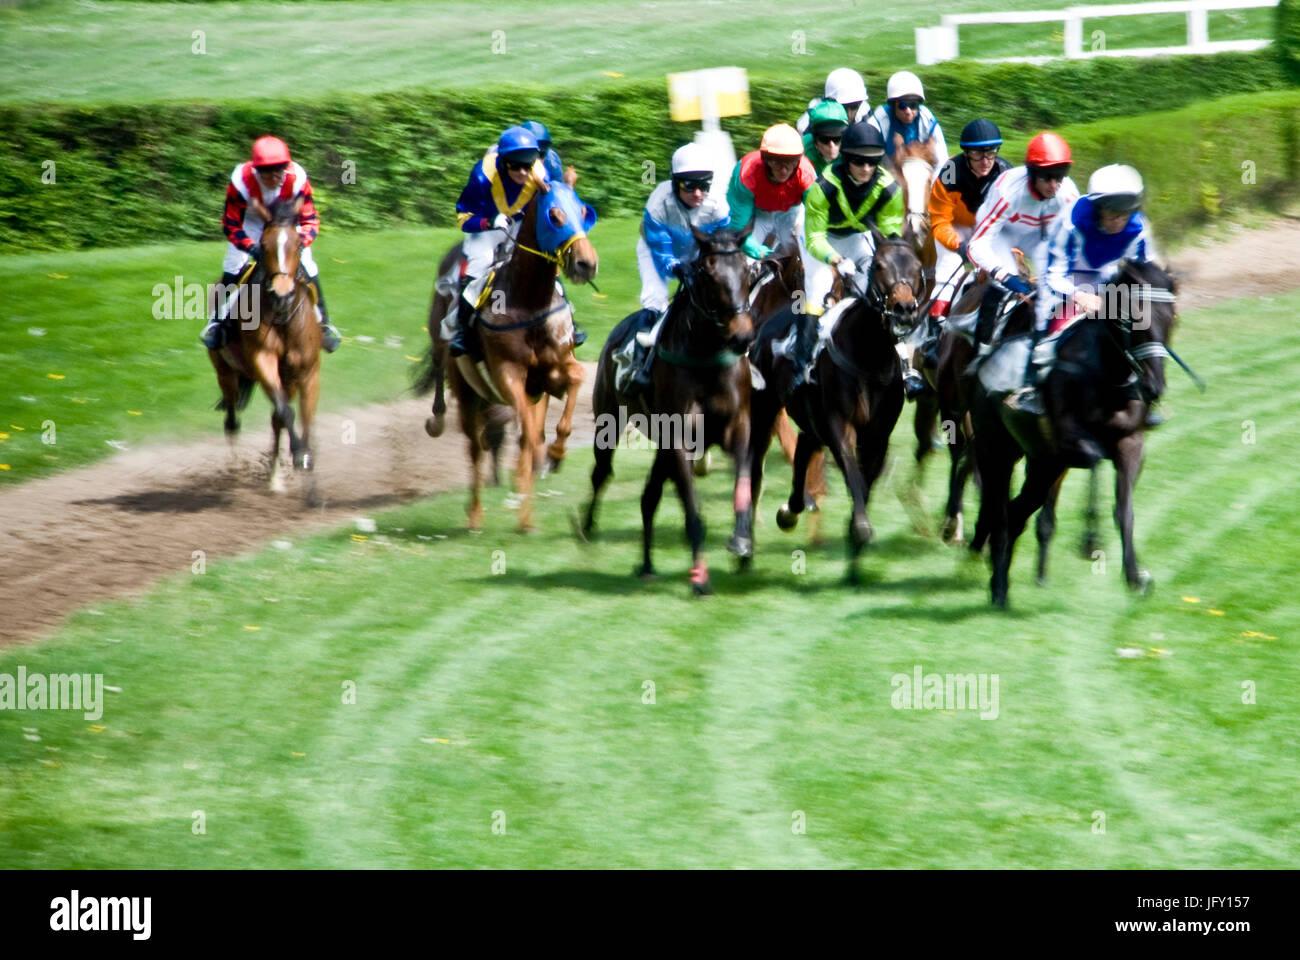 steeplechase horse race Stock Photo